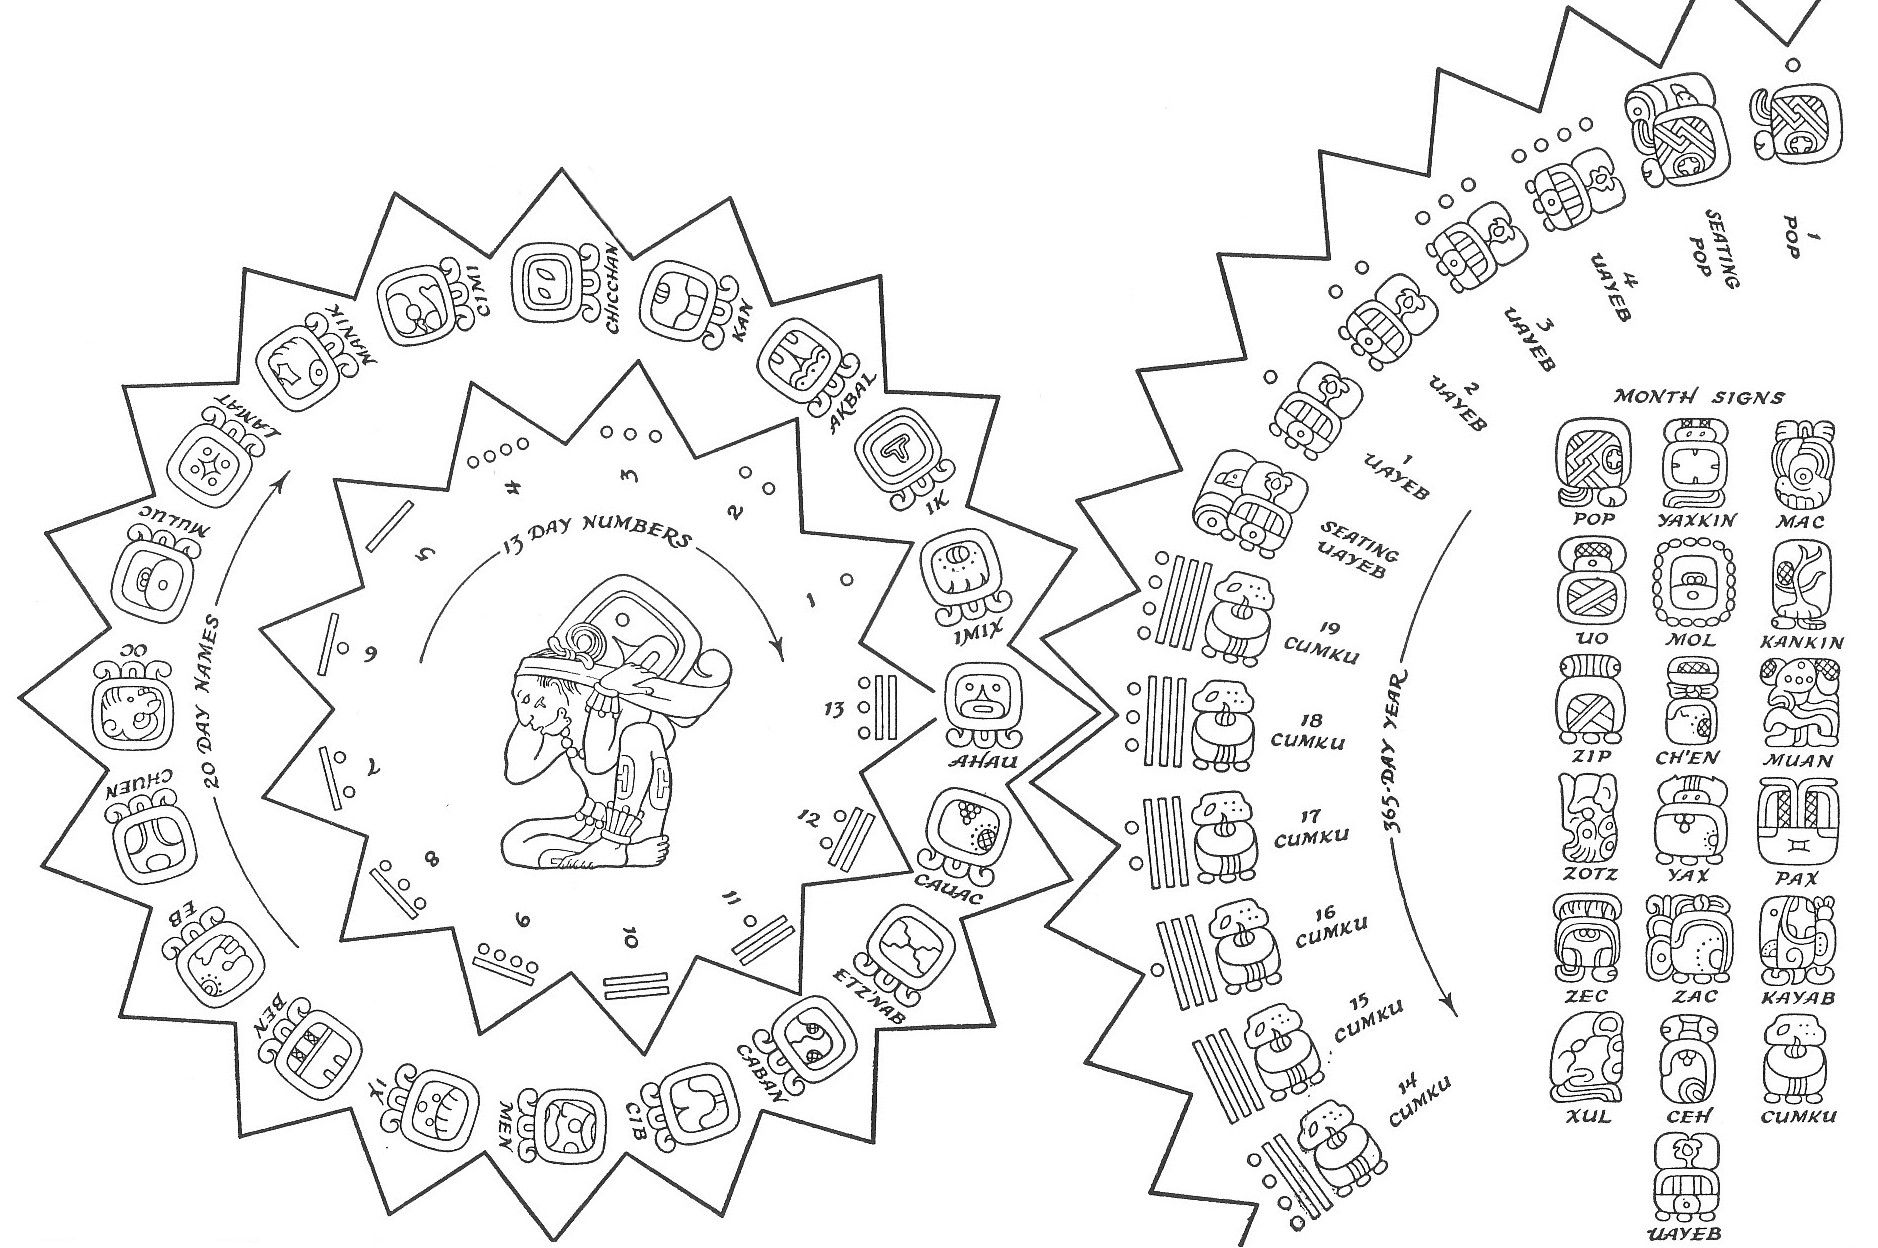 Calendrier Maya Dessin.Calendrier Maya Recherche Google Bsas Dessin